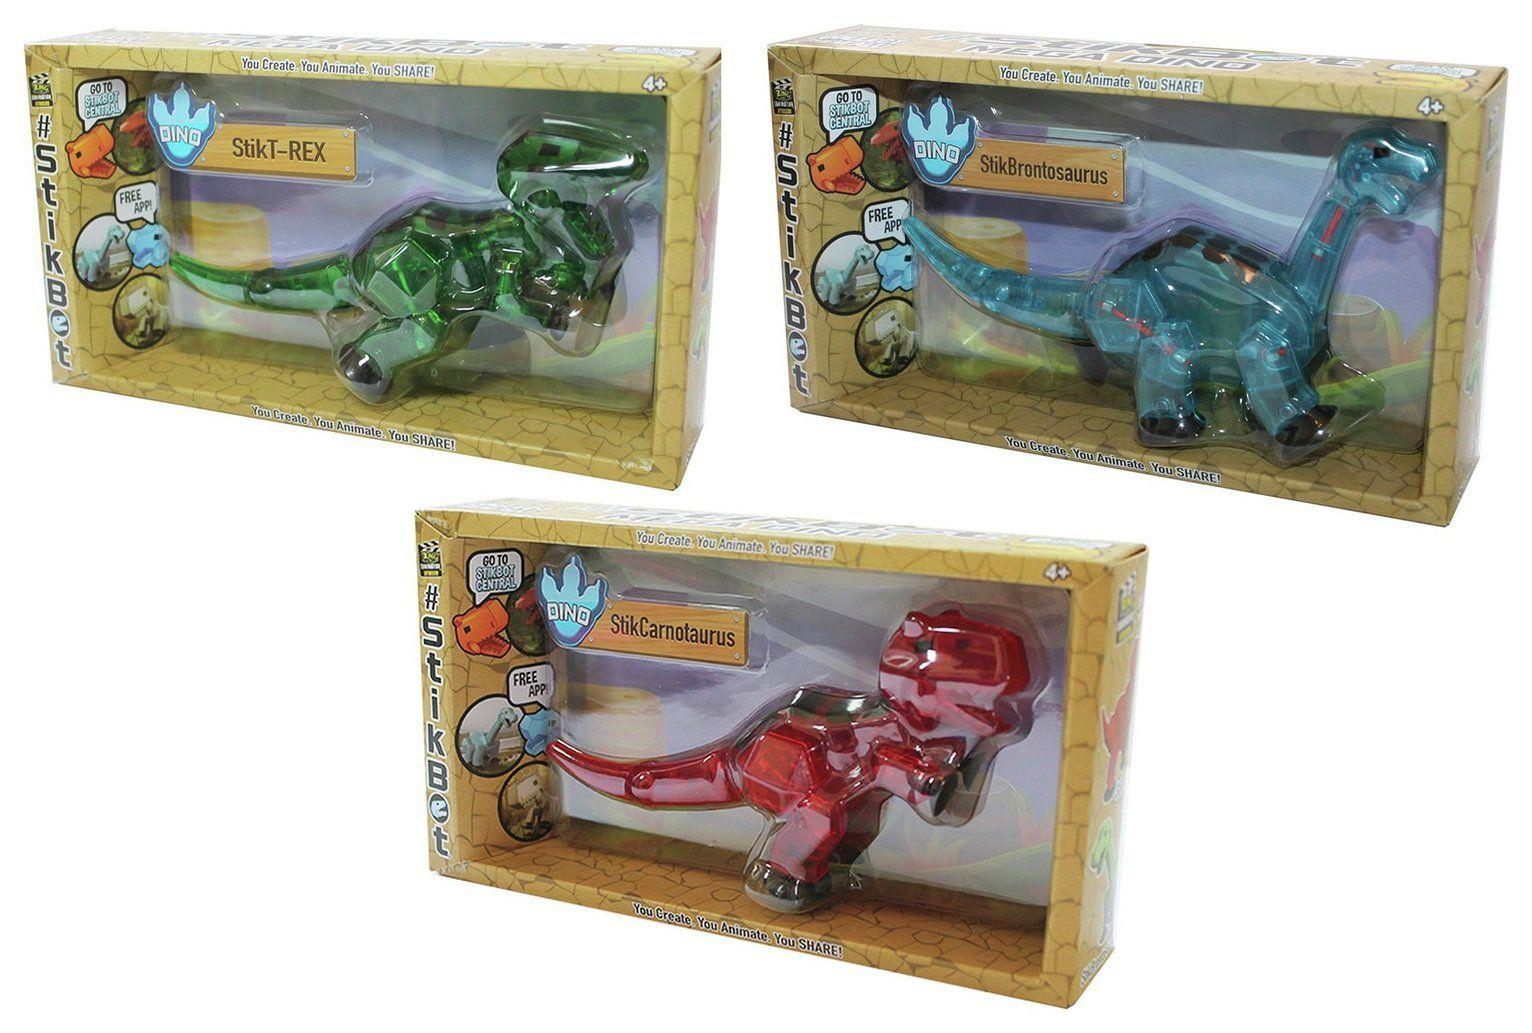 Zing Stikbot Mega Stikdino Dino Brontosaurus Red Green Dinosaur Blue